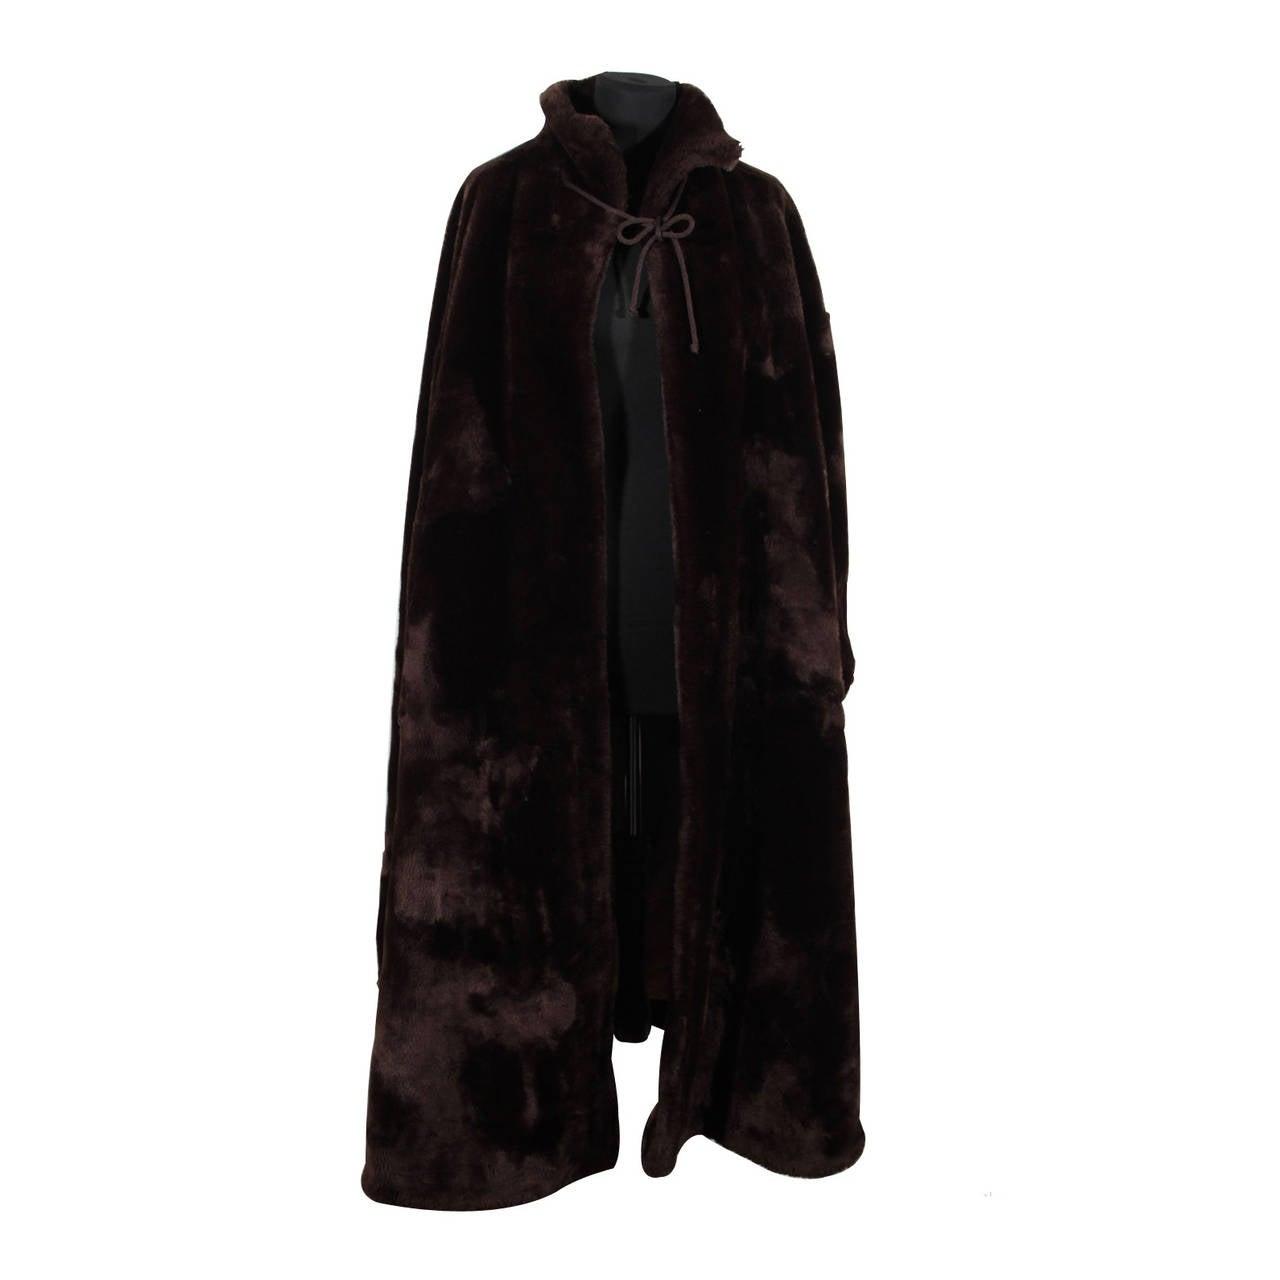 emporio armani italian vintage brown faux fur full lenght cape coat mantle at 1stdibs. Black Bedroom Furniture Sets. Home Design Ideas